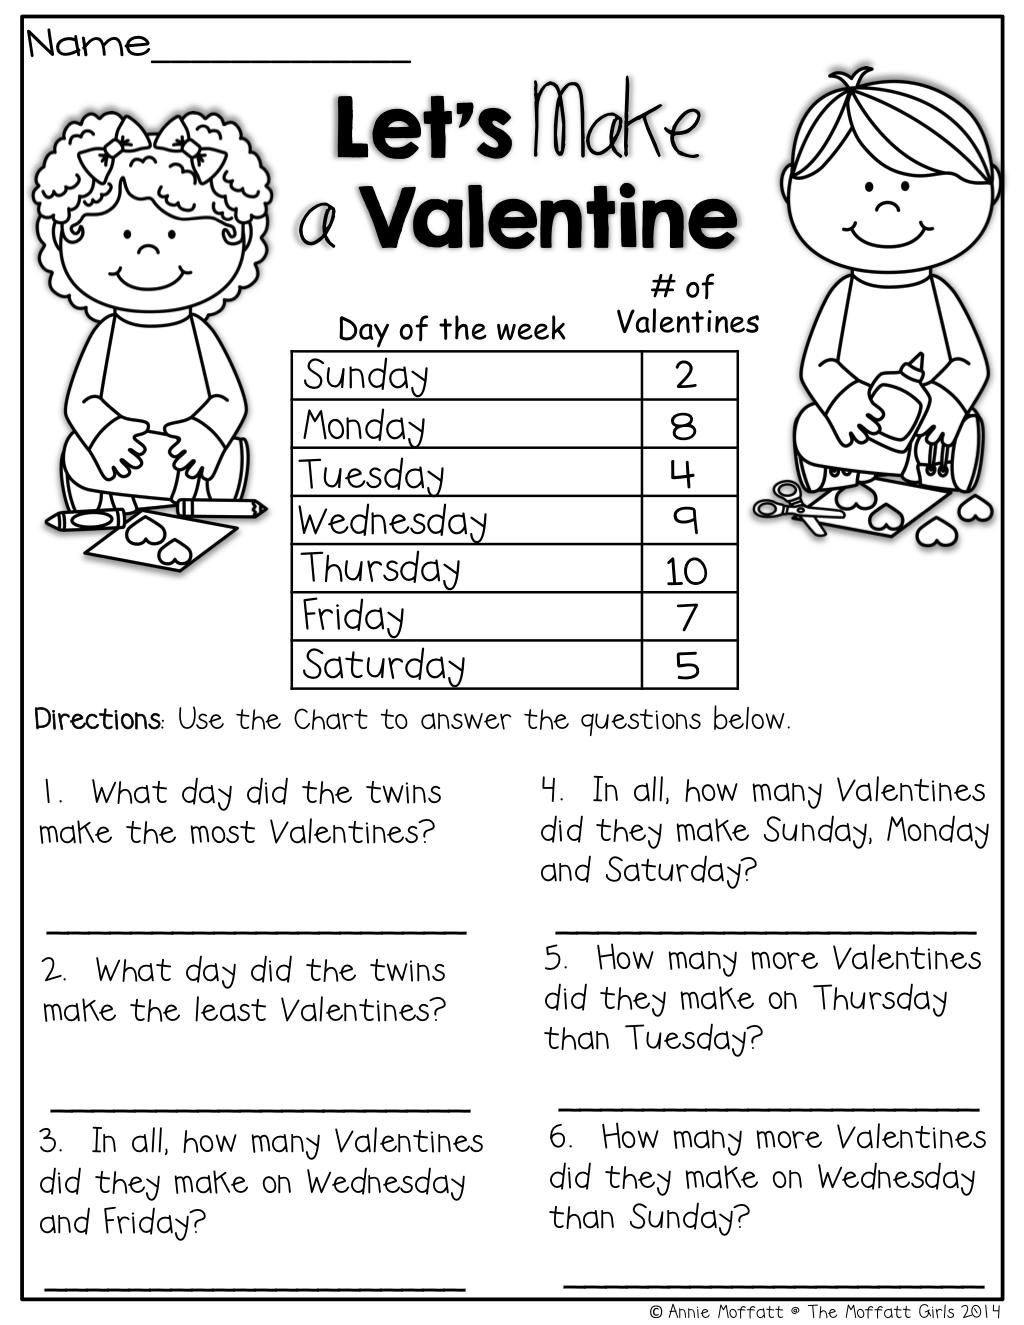 hight resolution of The Moffatt Girls: Valentine NO PREP Packets!   1st grade activities